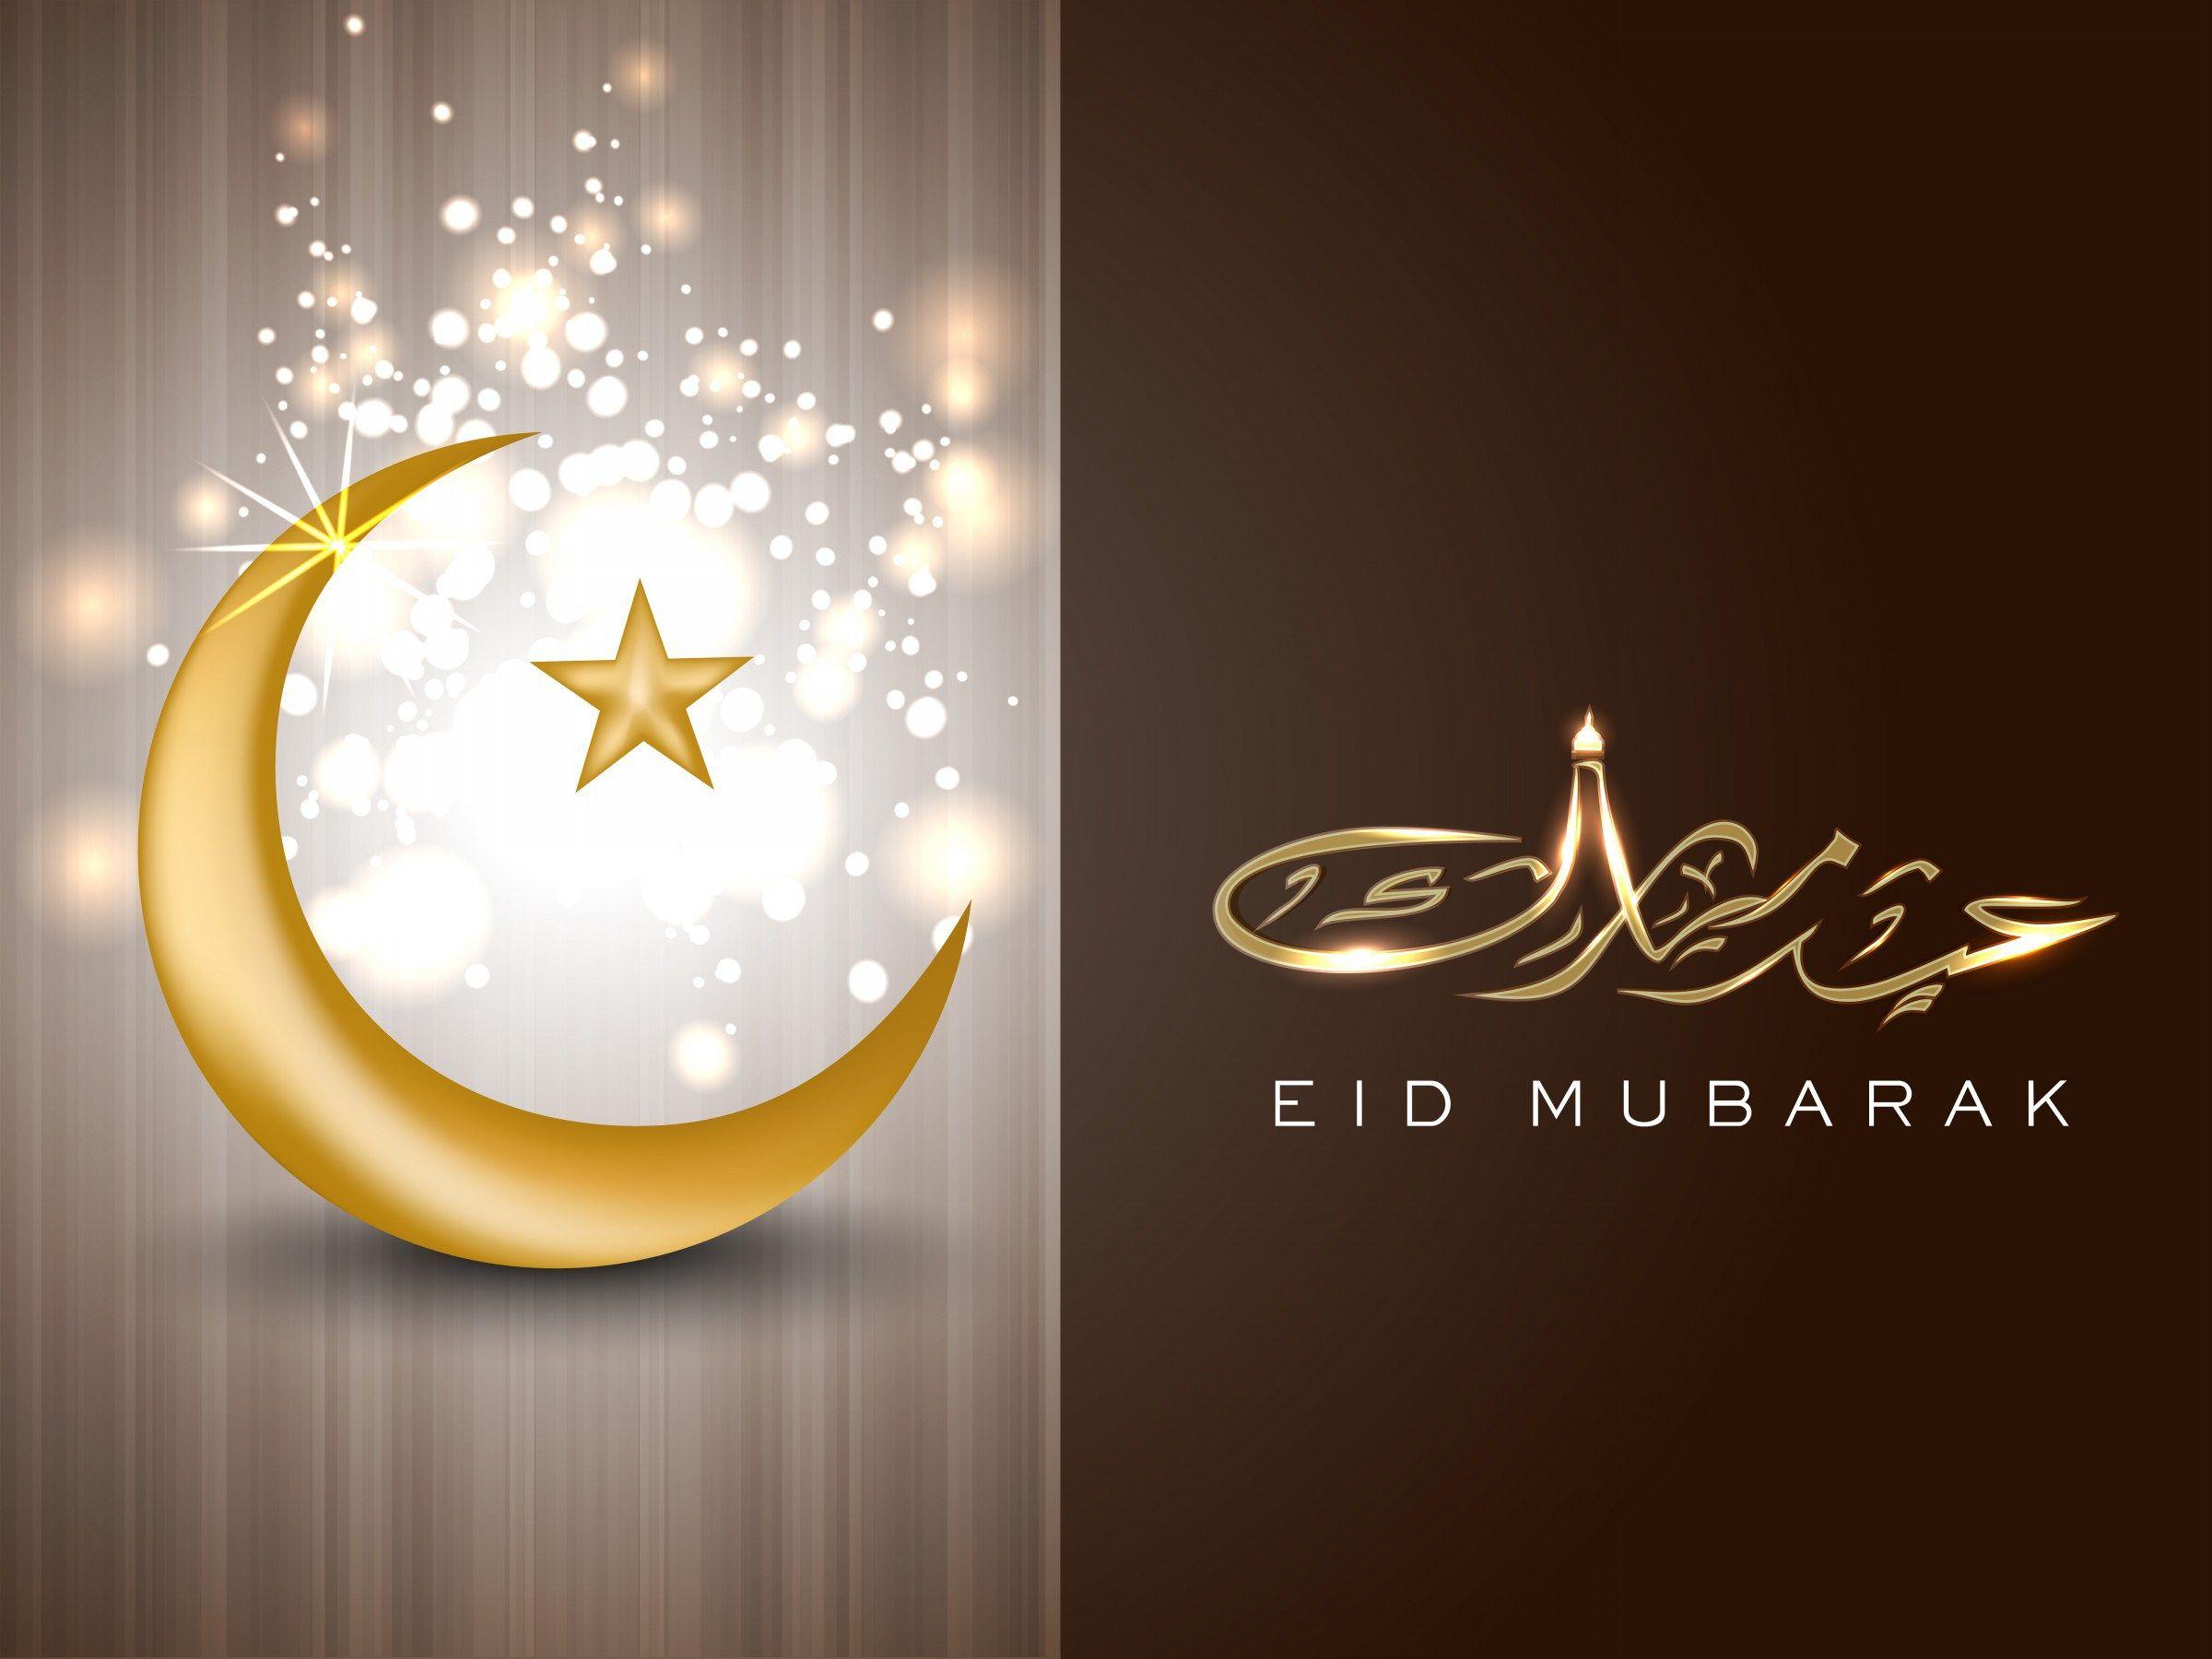 Eid Mubarak In Arabic Hd F Pinterest Eid Mubarak Eid And Eid